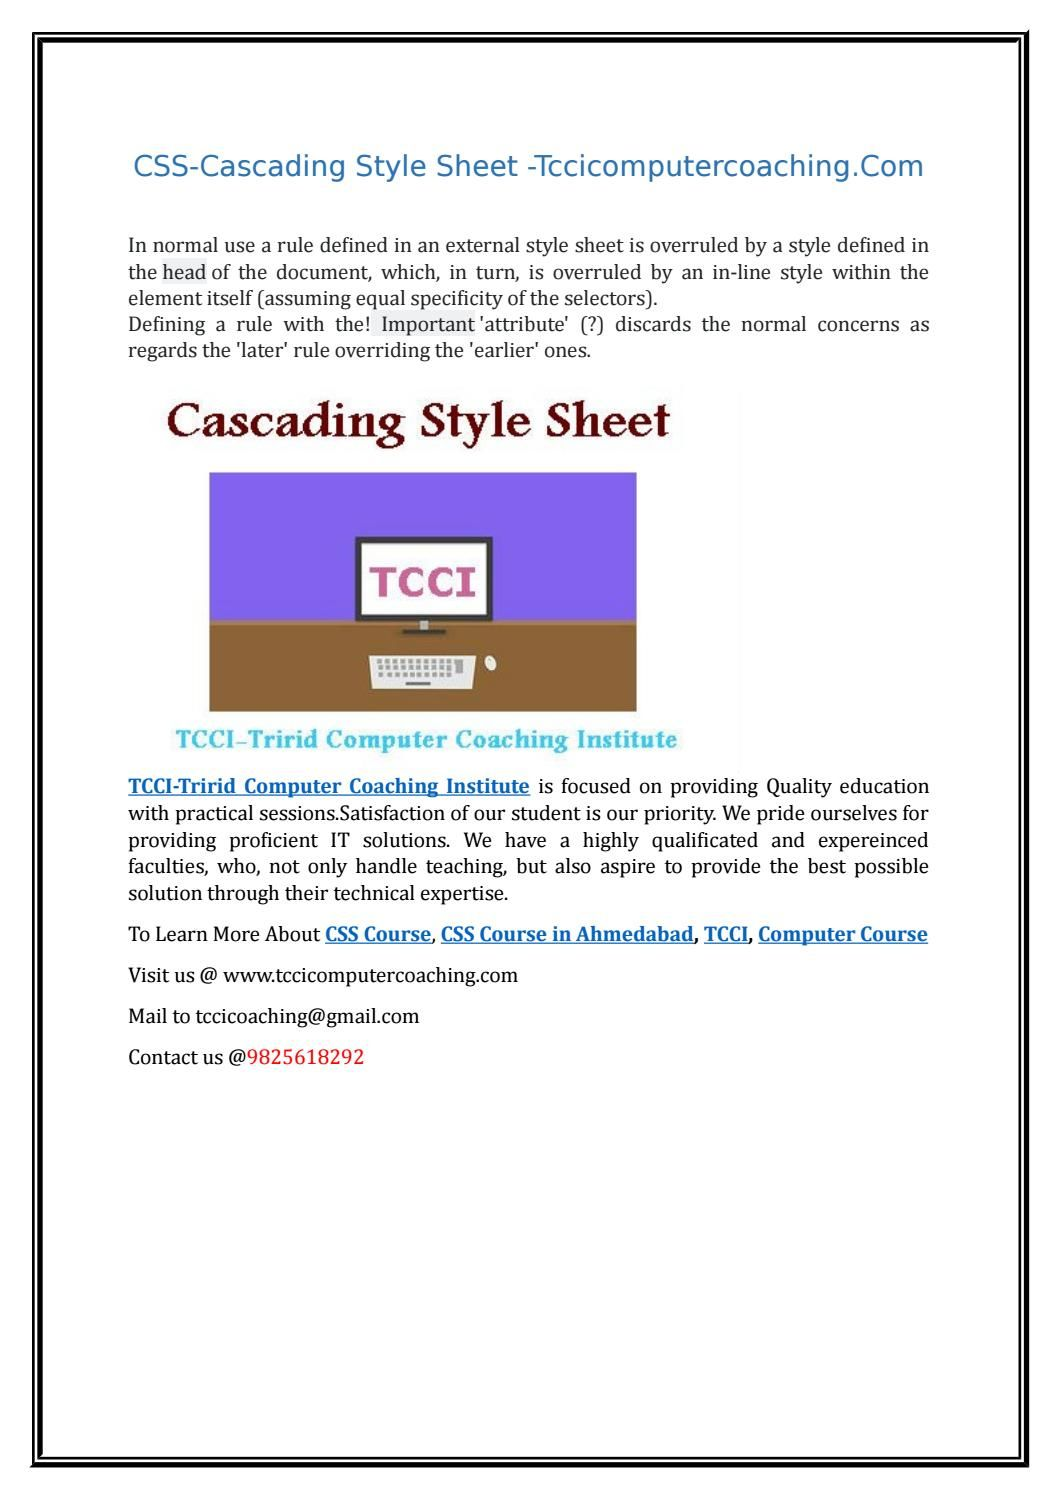 Css cascading style sheet com